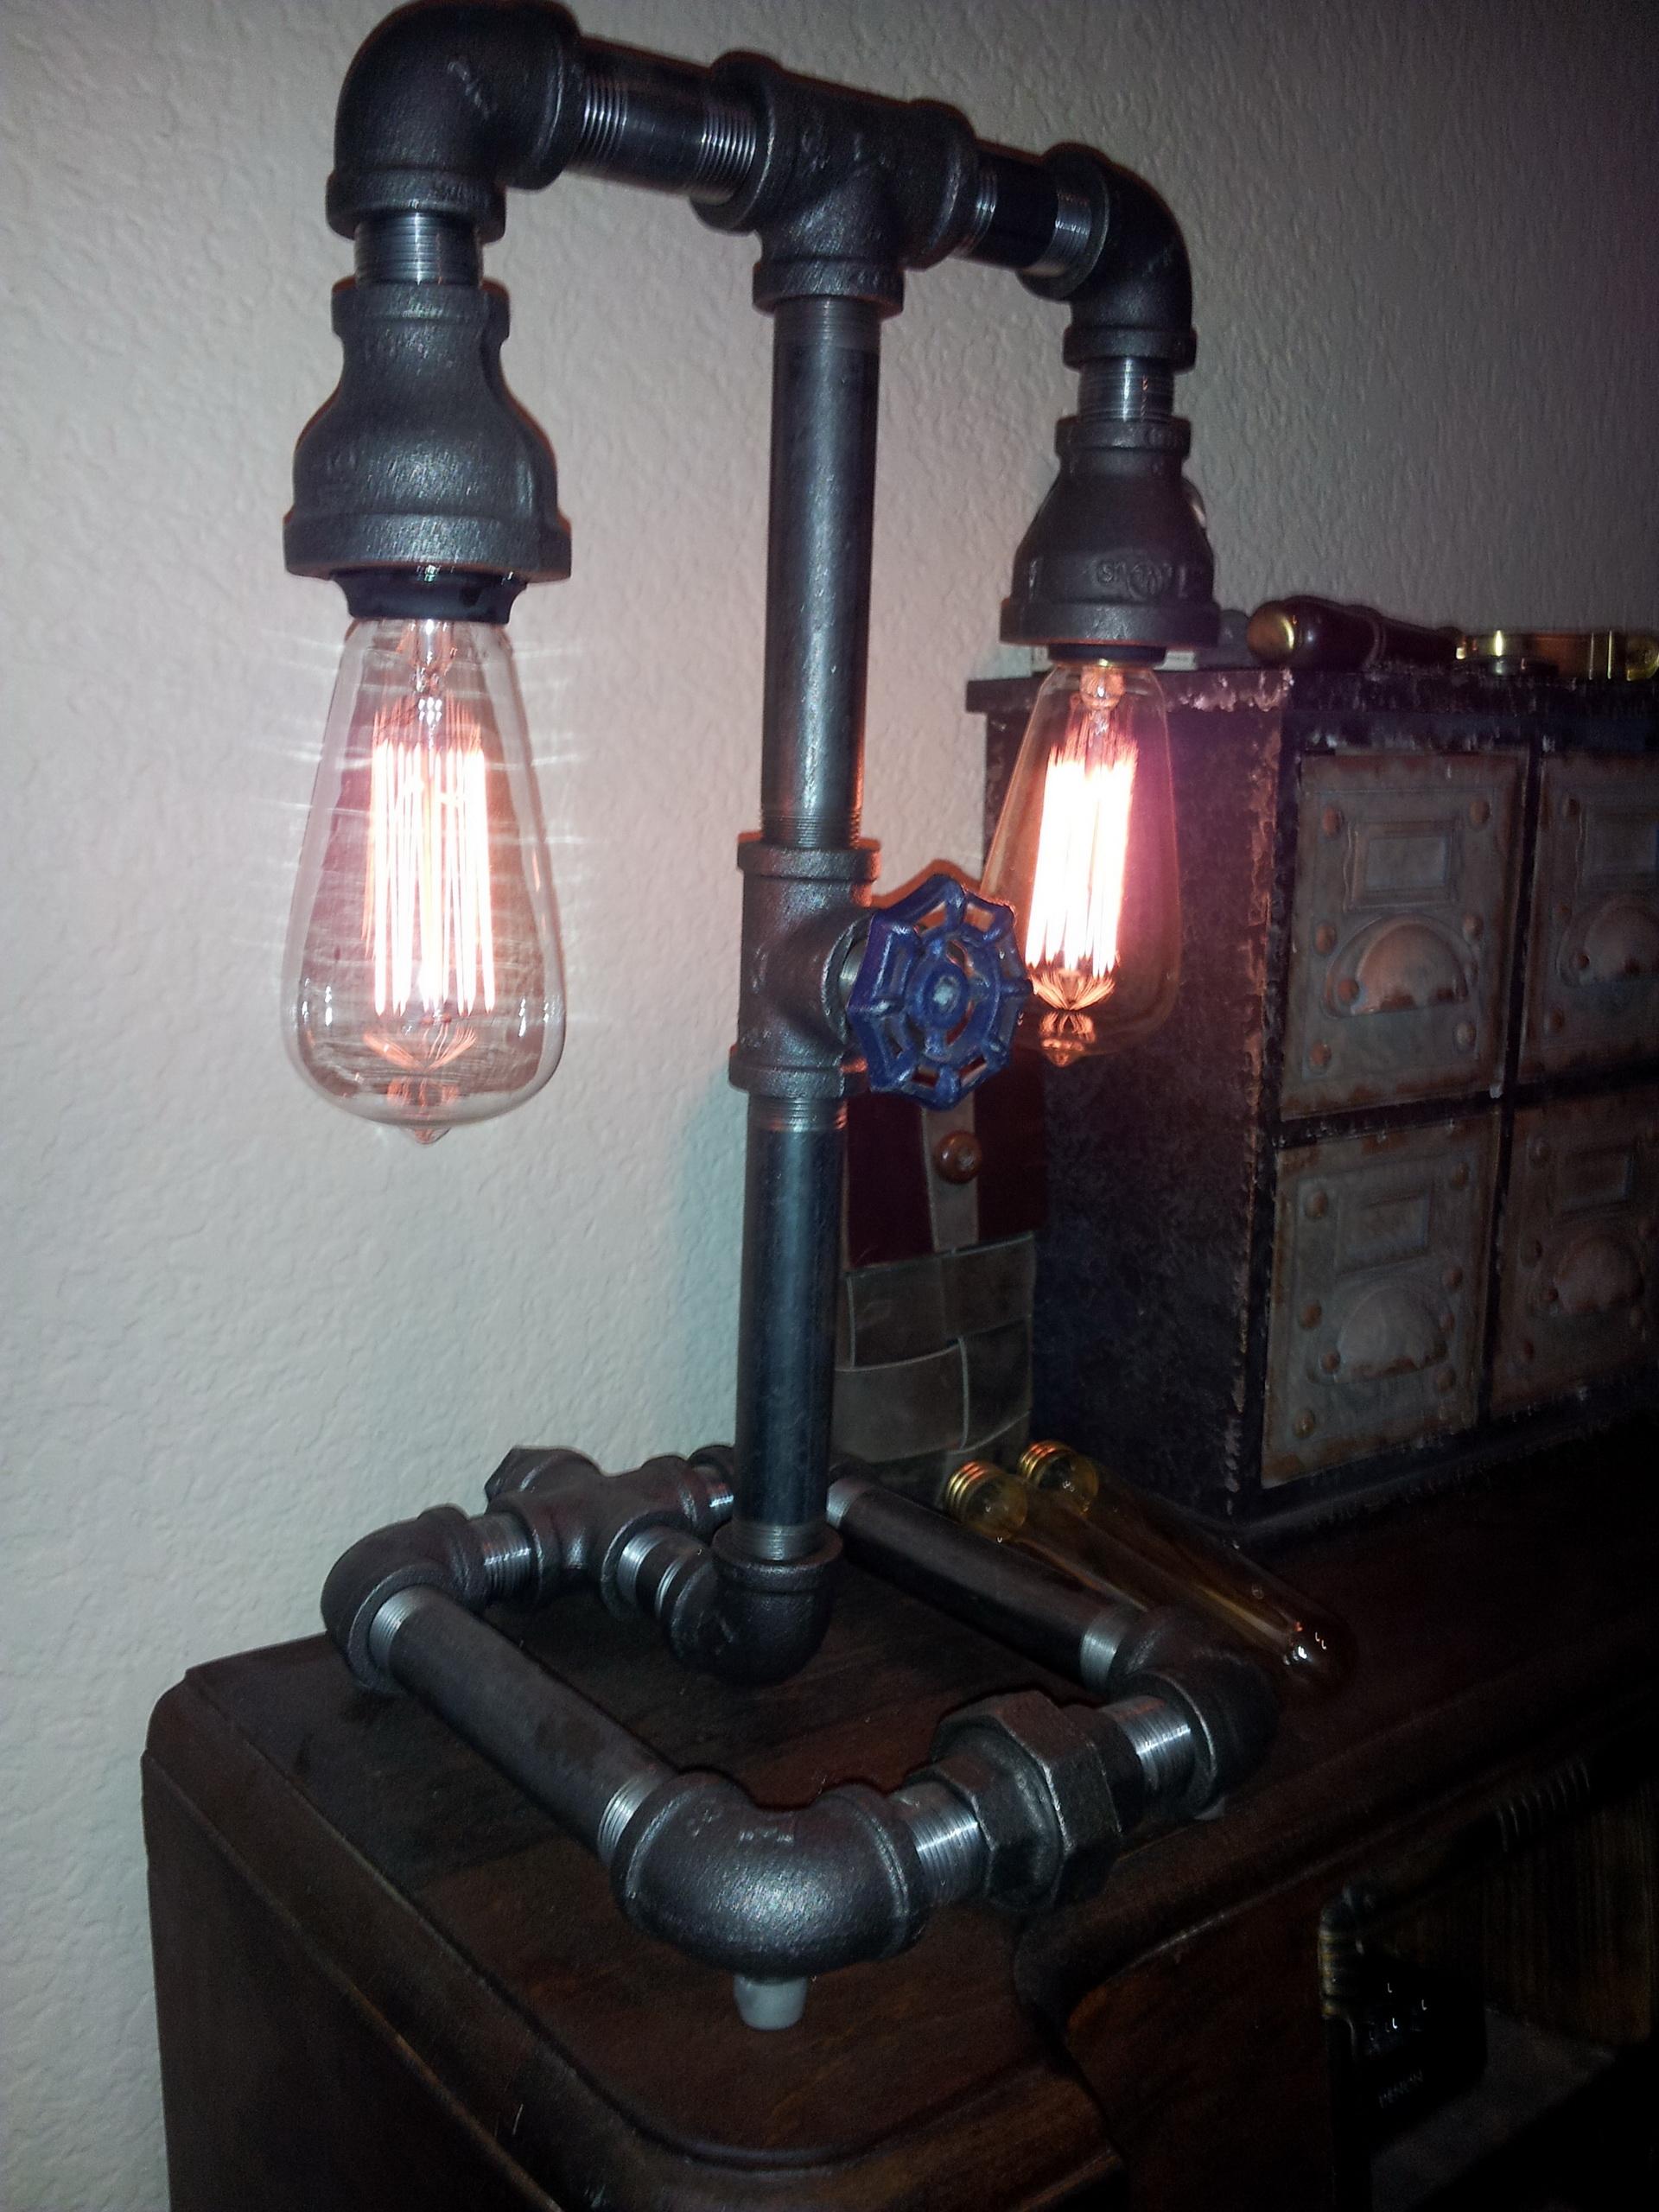 verwunderlich industrial style lampen fotos erindzain. Black Bedroom Furniture Sets. Home Design Ideas